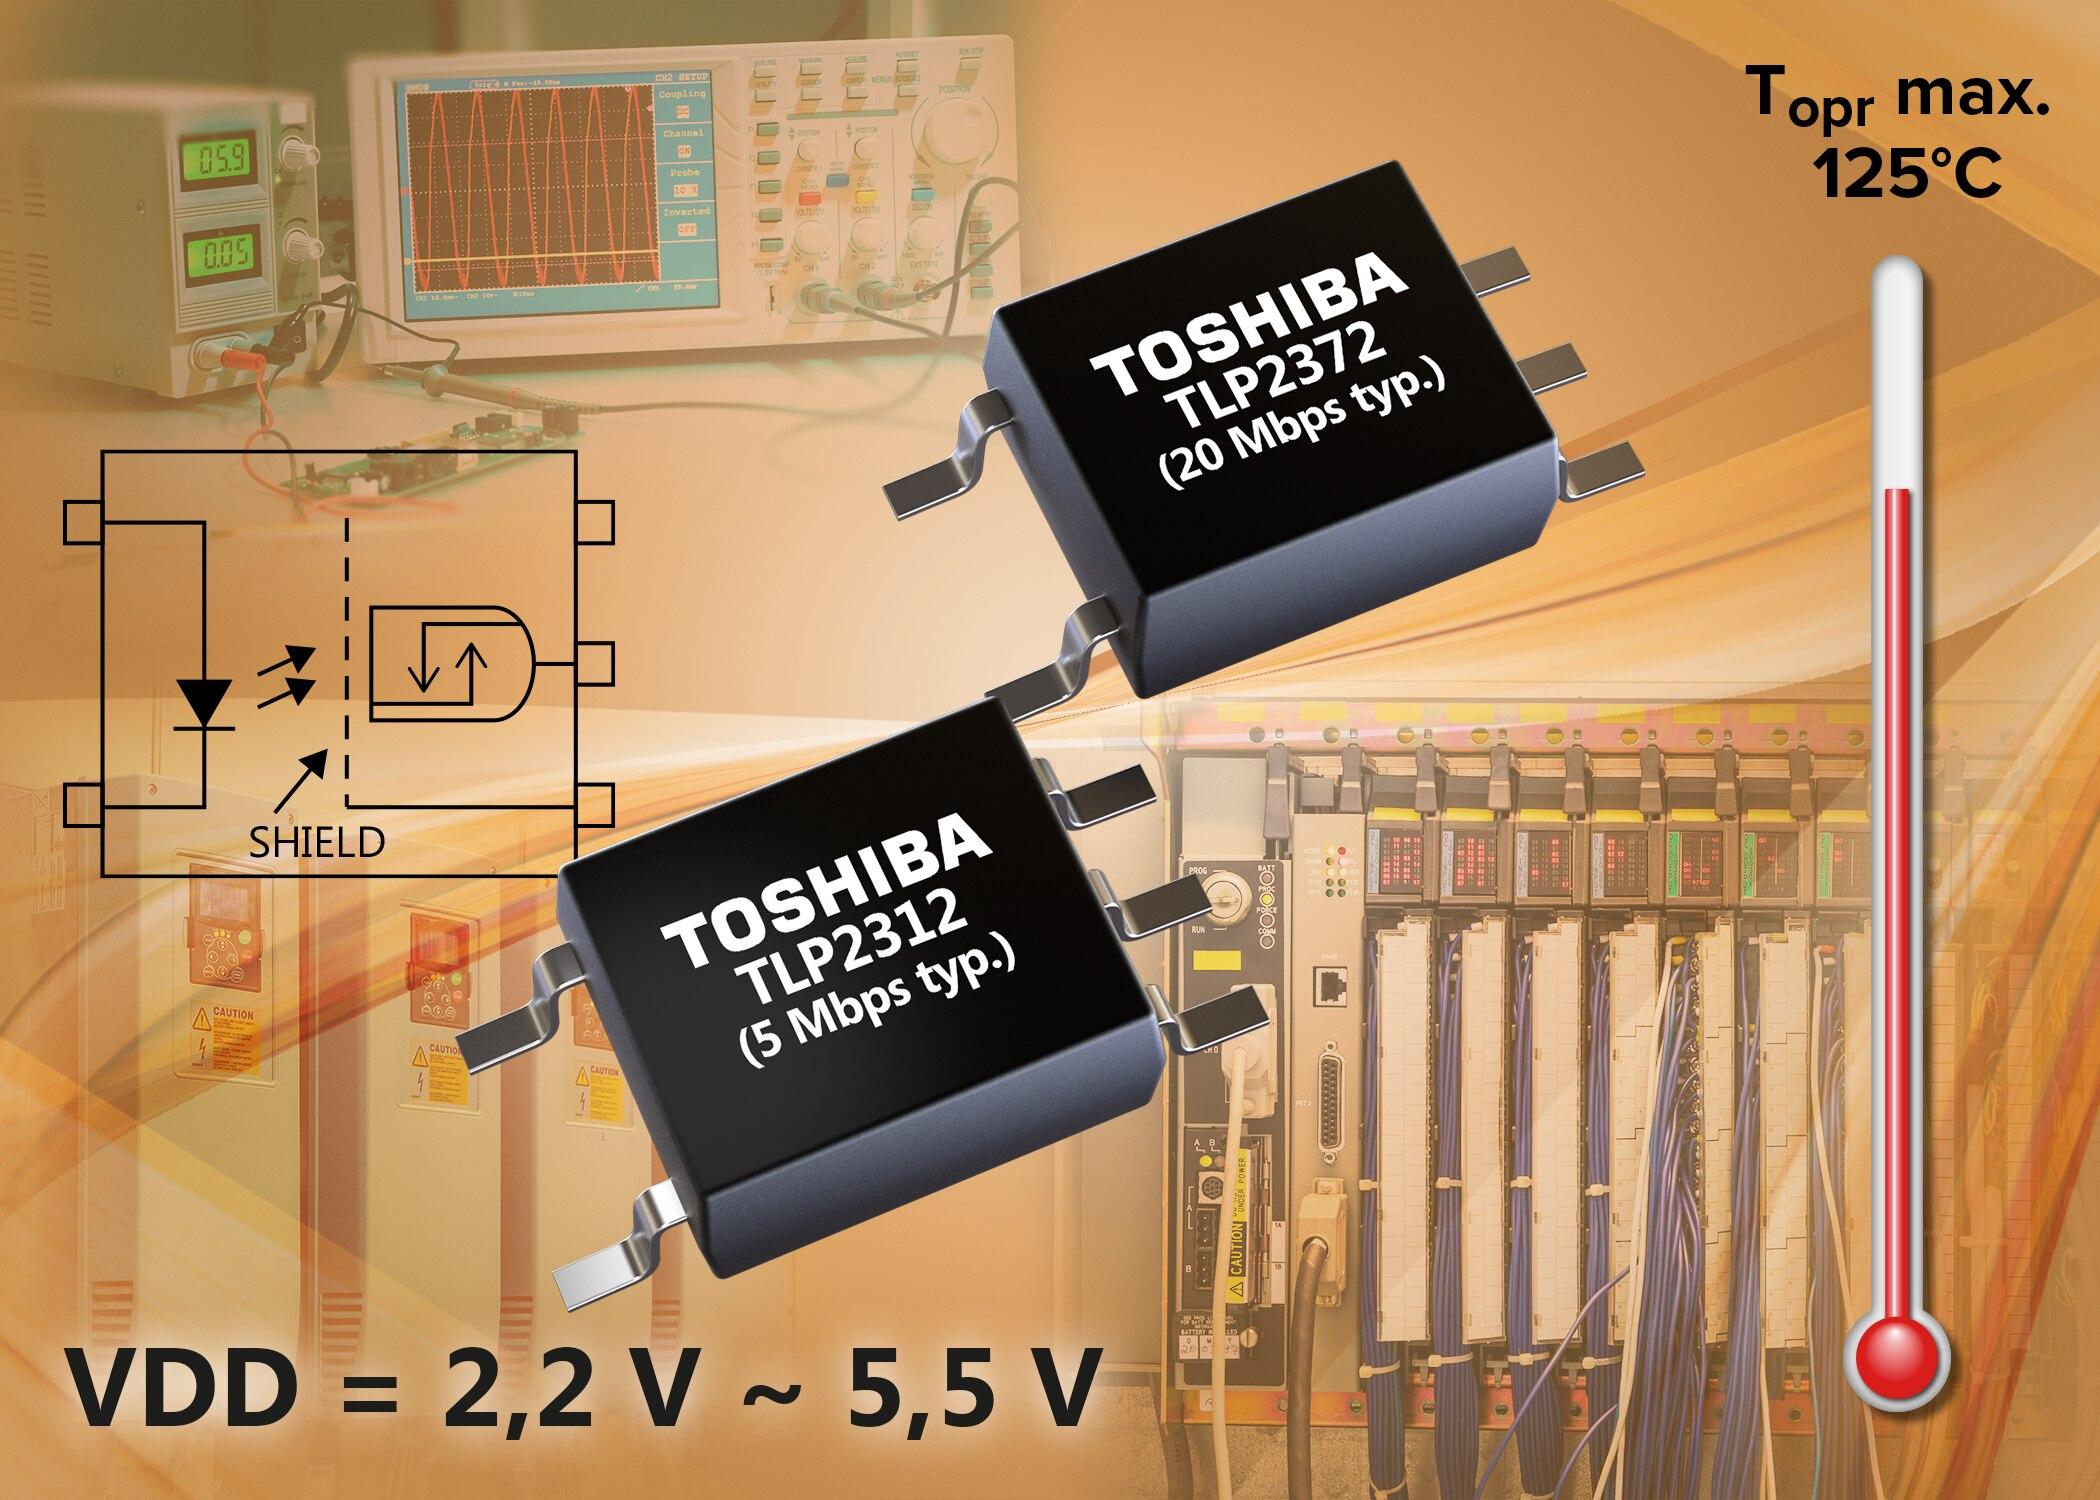 Toshiba_TLP2312 and TLP2372.jpg